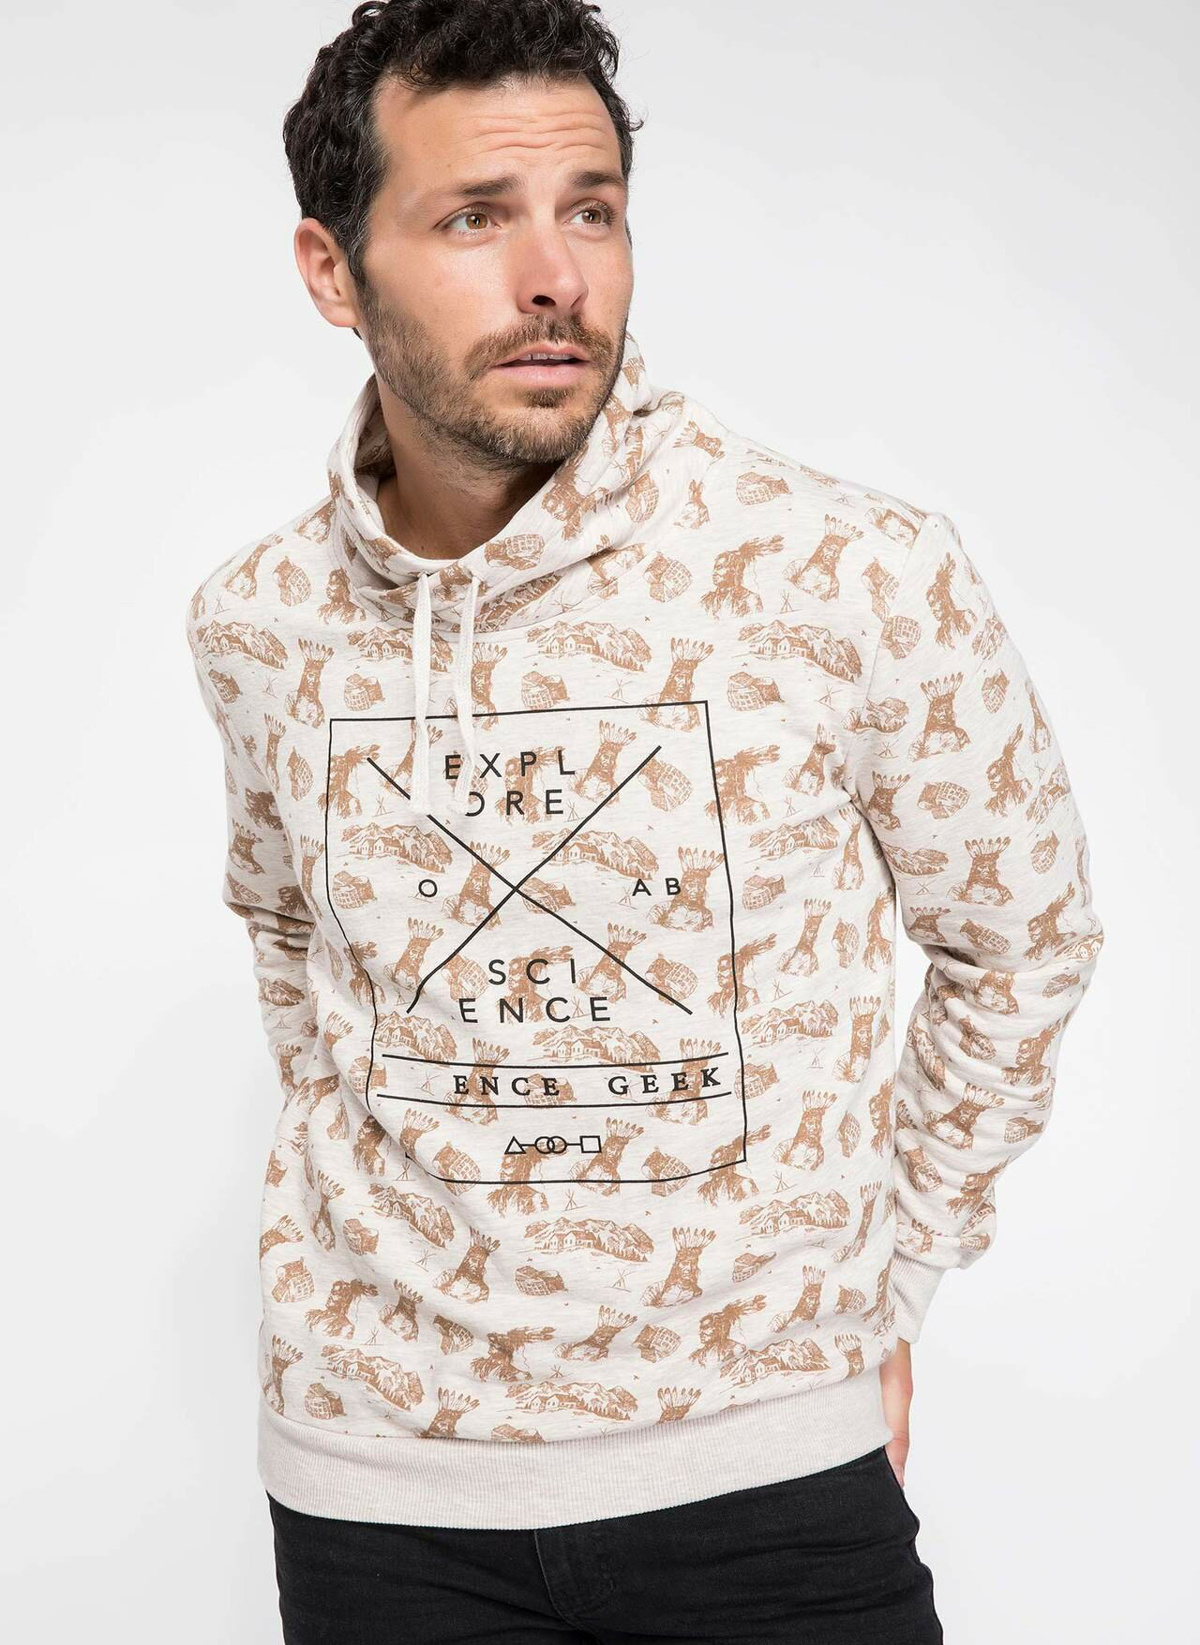 Defacto Desenli Şal Yaka Slim Fit Sweatshirt J1918az18wnbg300 Sweatshirt – 39.99 TL